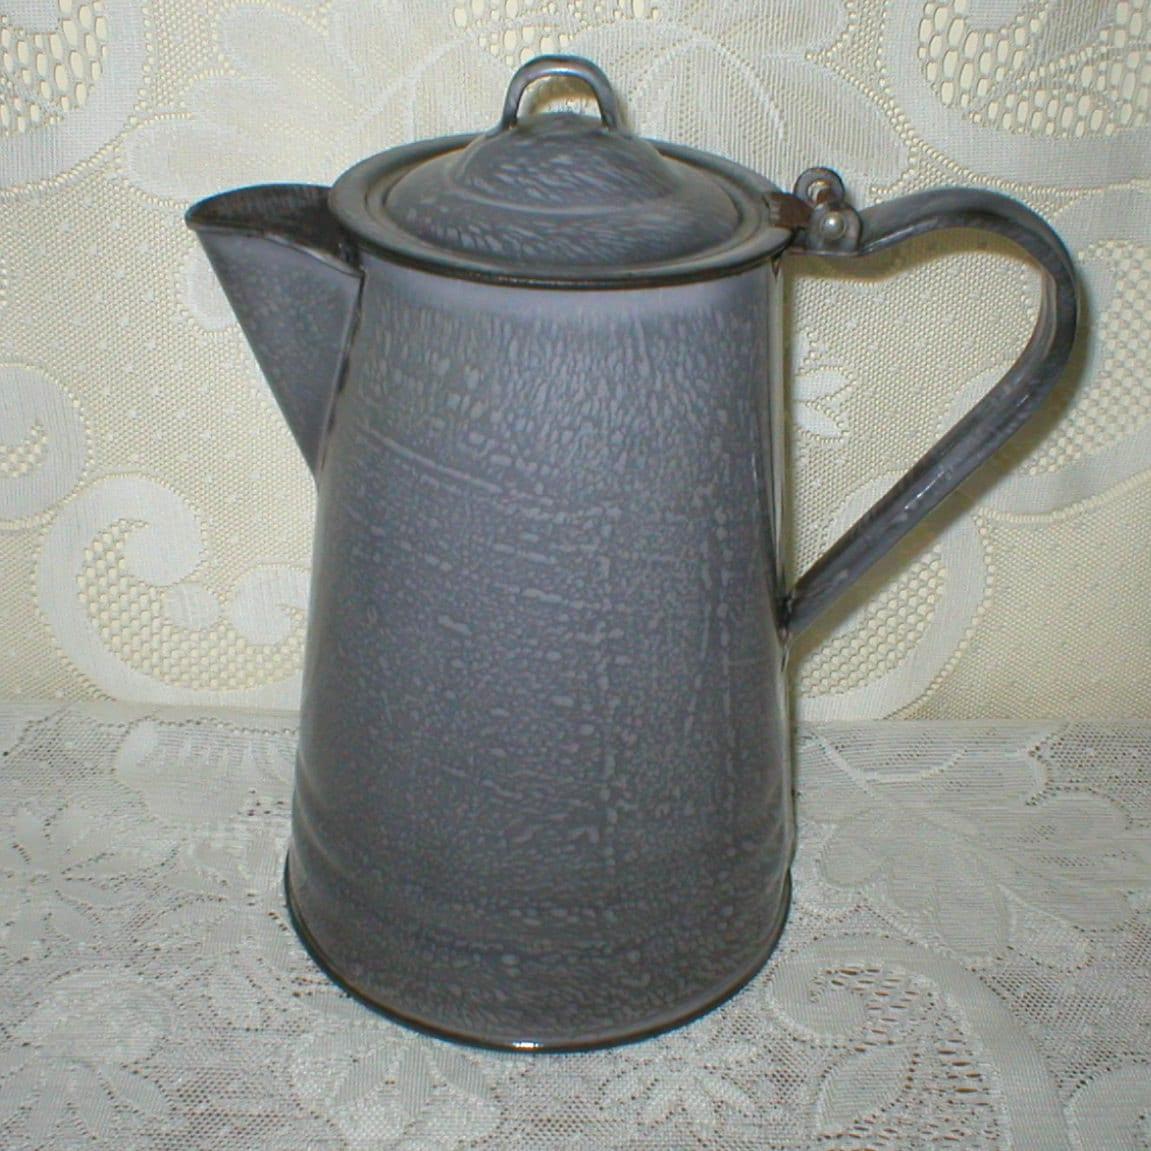 Antique Enamelware Coffee Pot Gray Graniteware Enamel Vintage